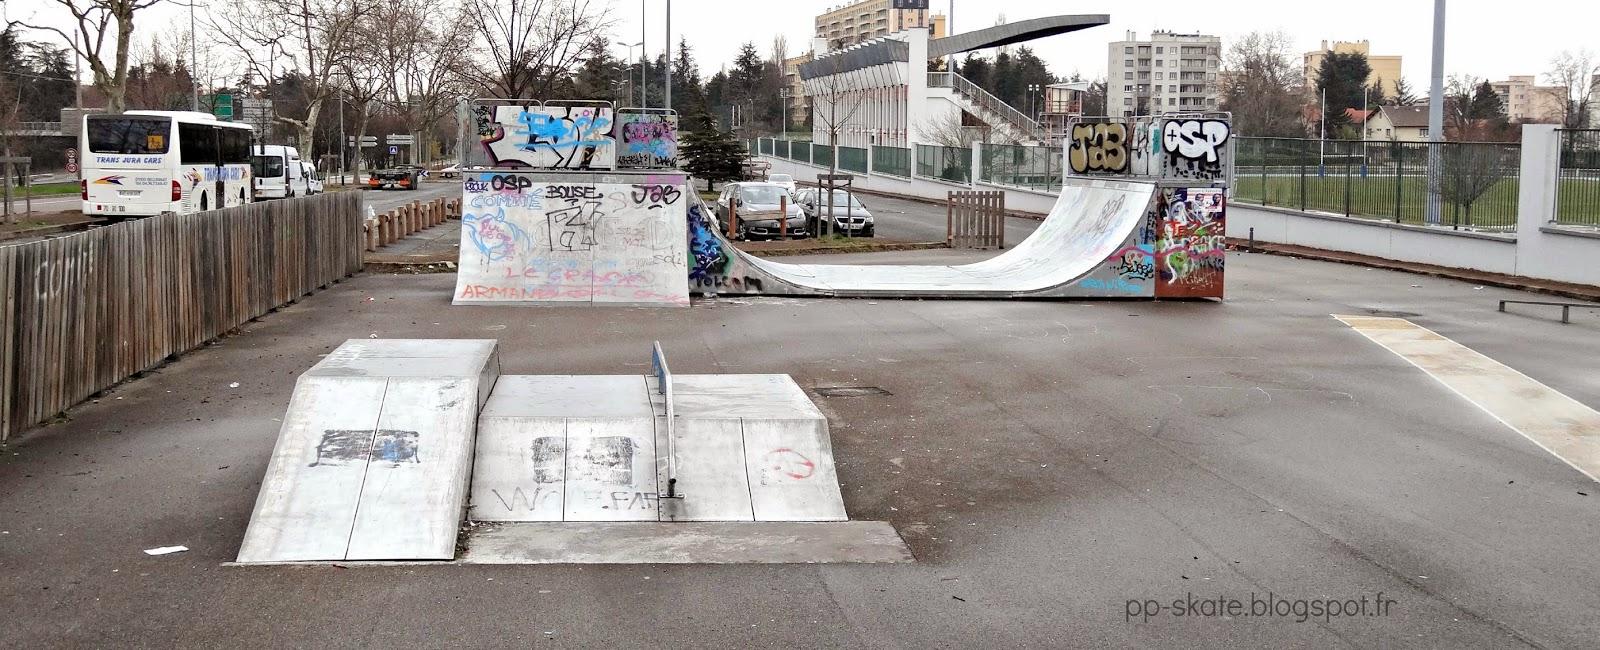 Skatepark Bron Lyon